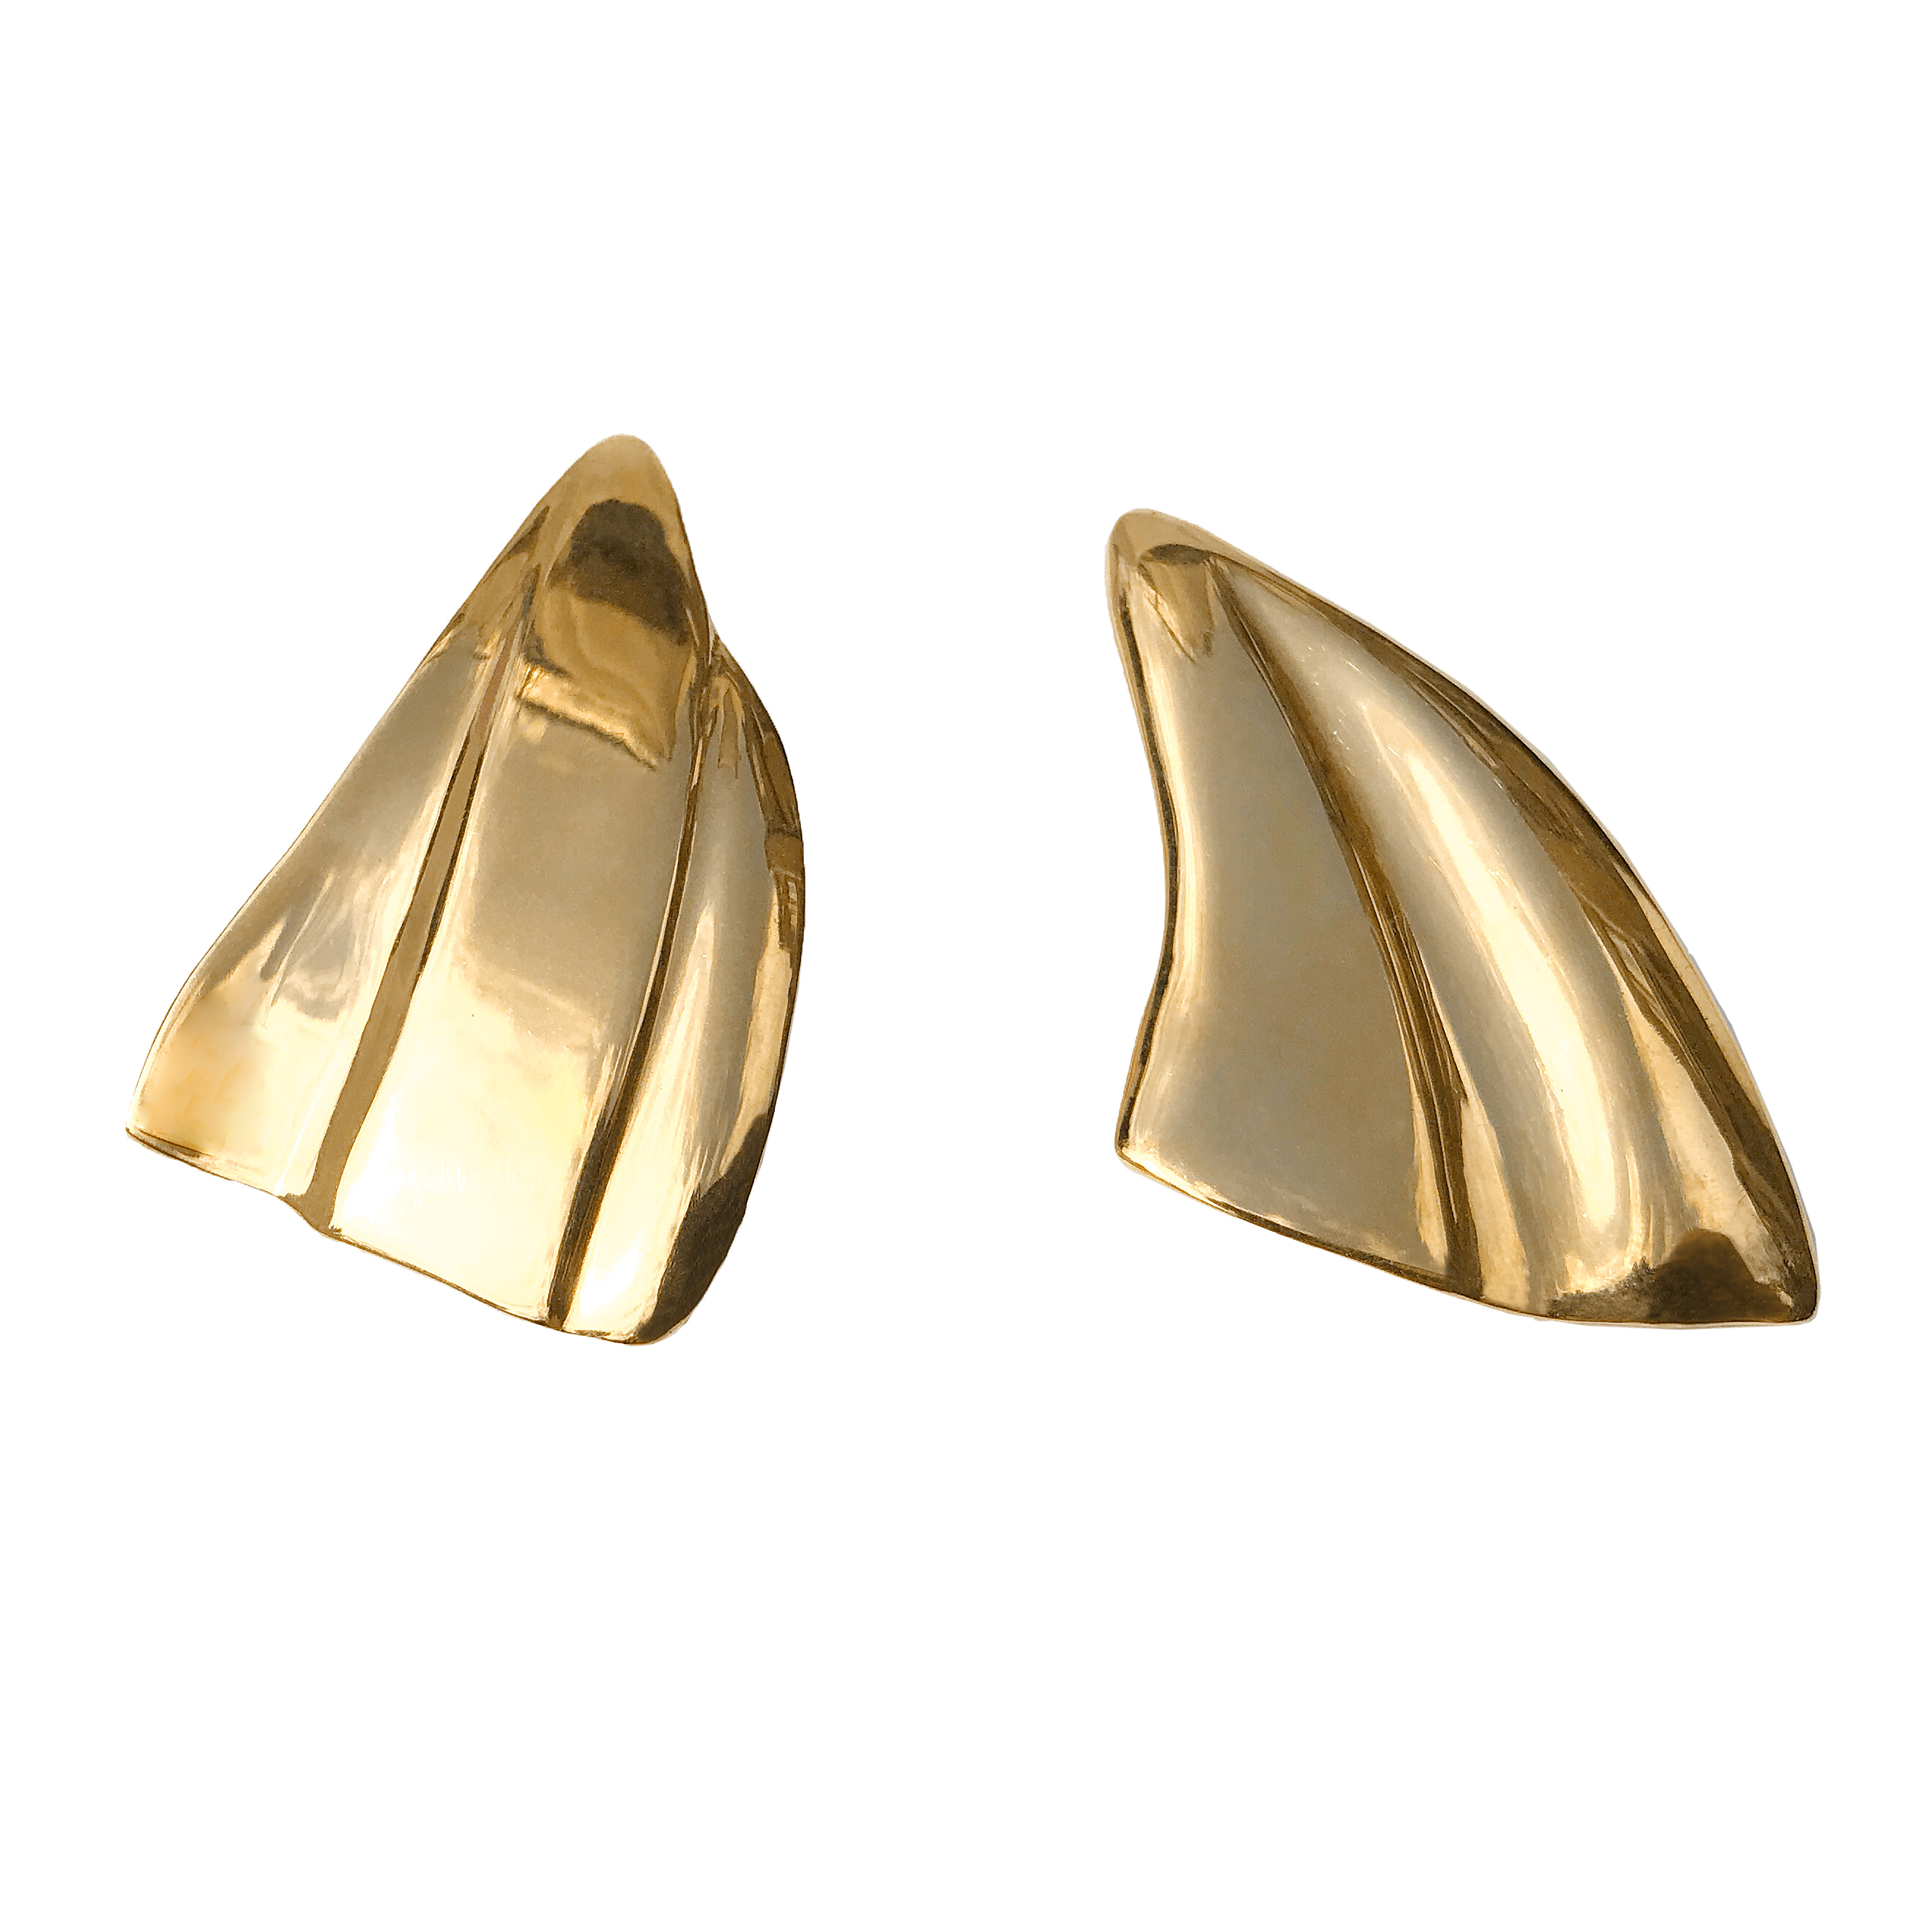 Lorne Earrings (copy) by RUDDOCK JEWELLERY on curated-crowd.com